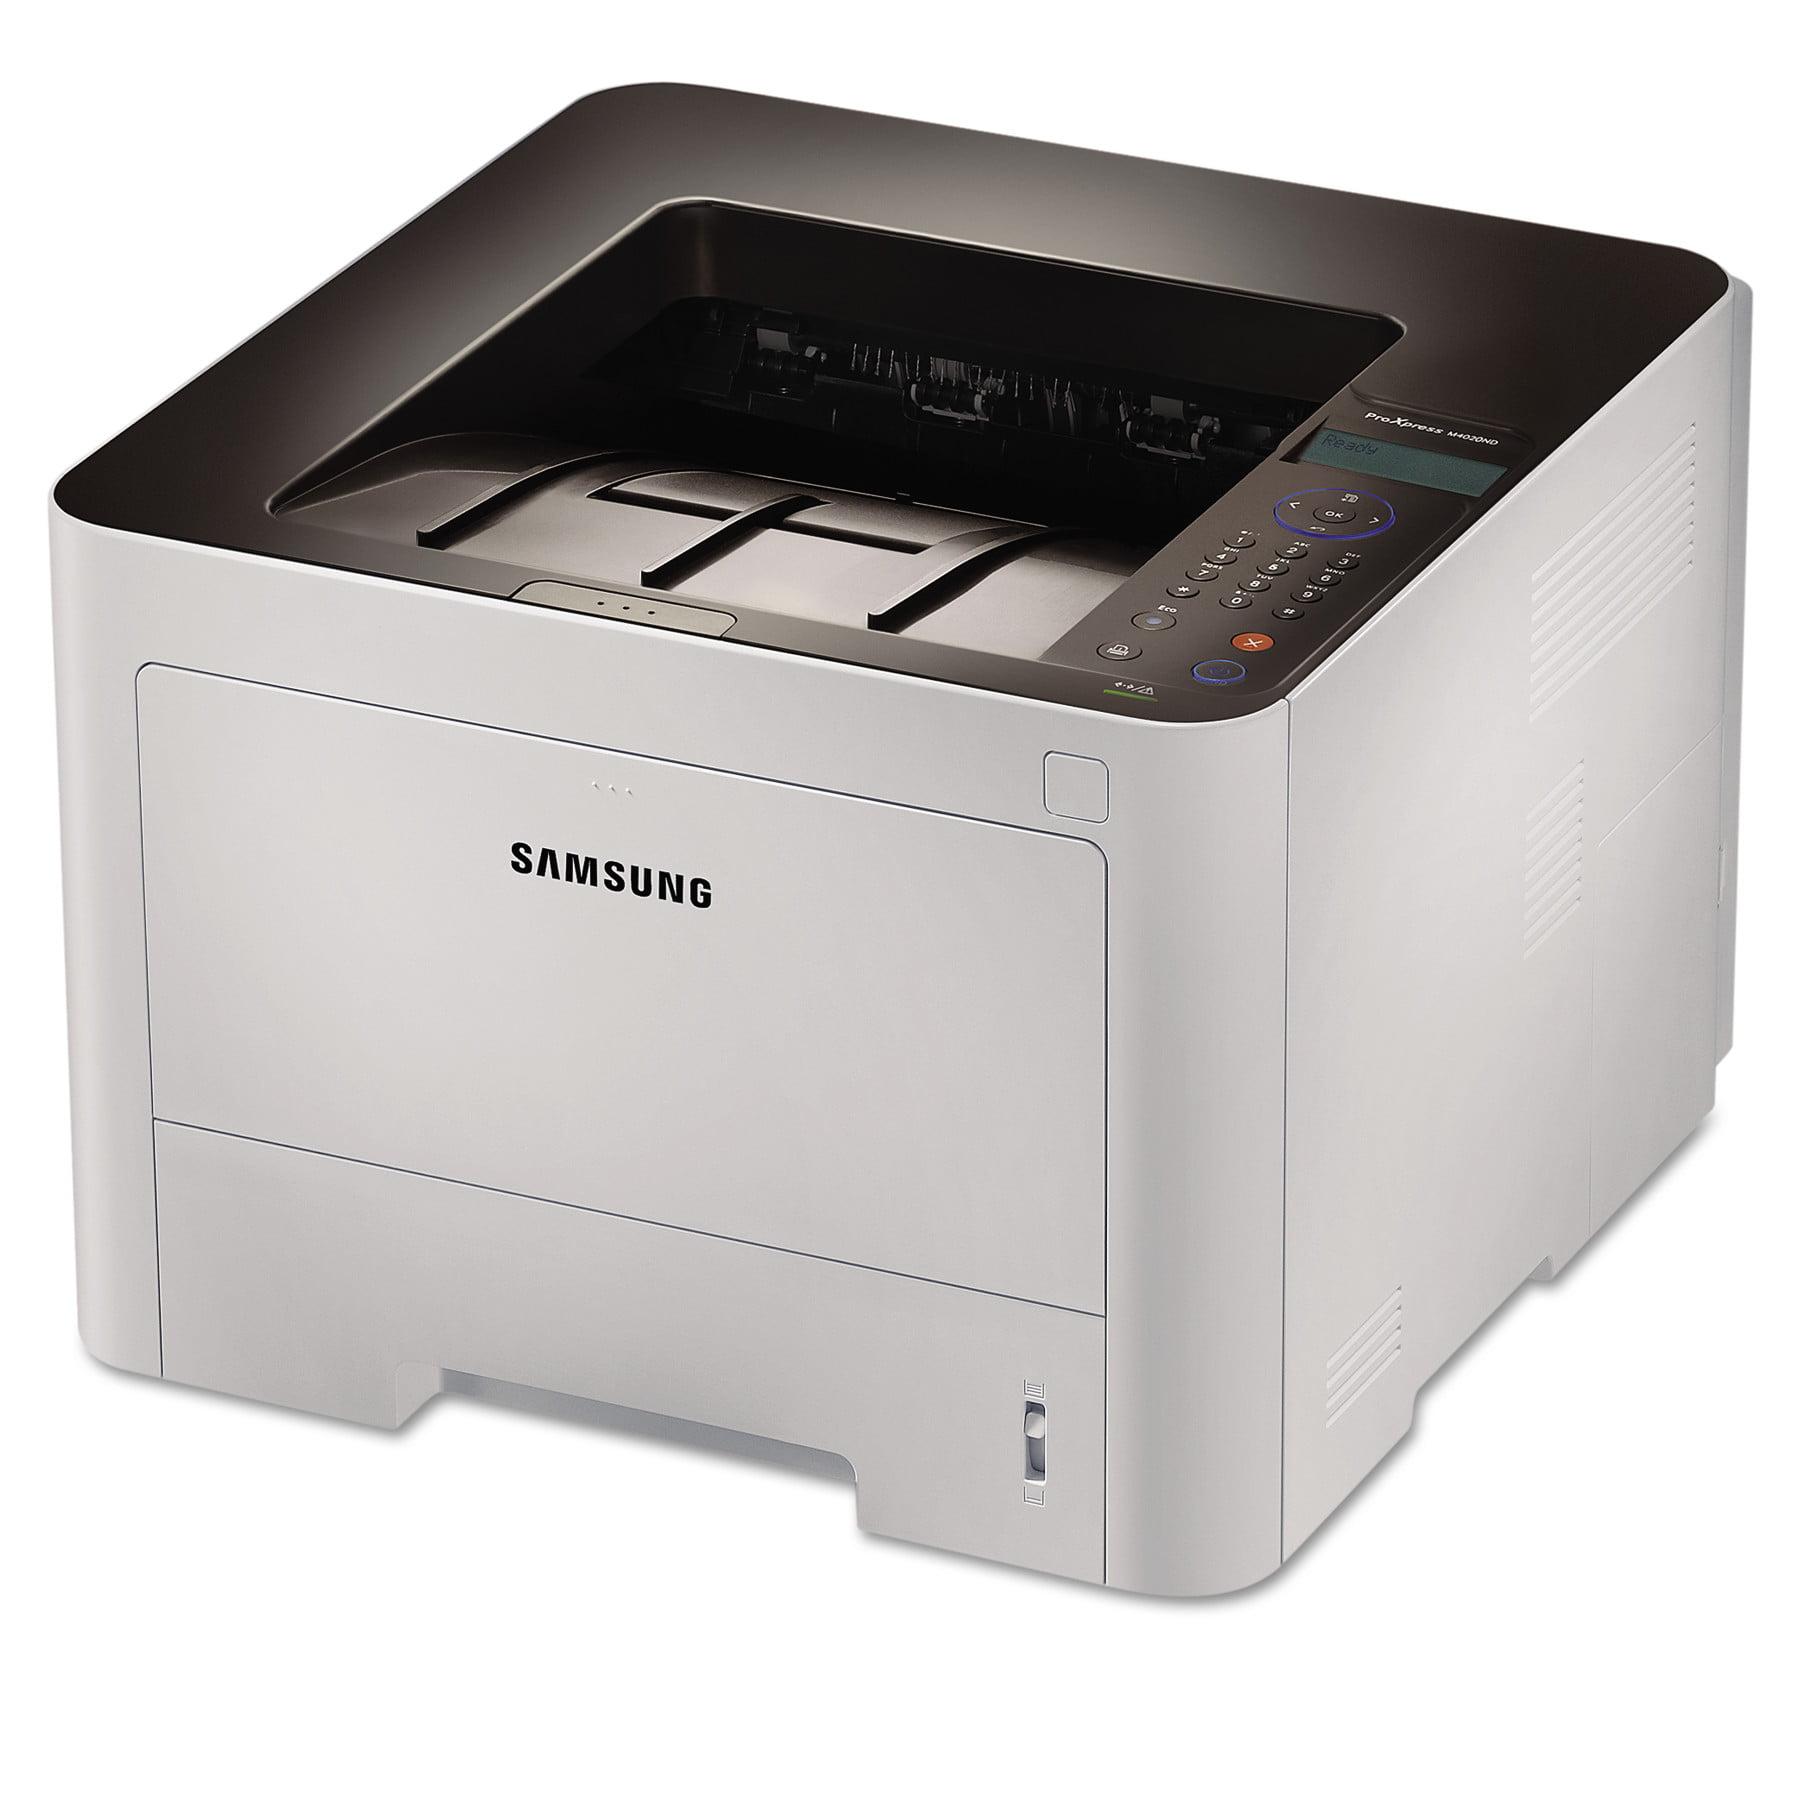 Samsung ProXpress SL-M4020ND Monochrome Laser Printer